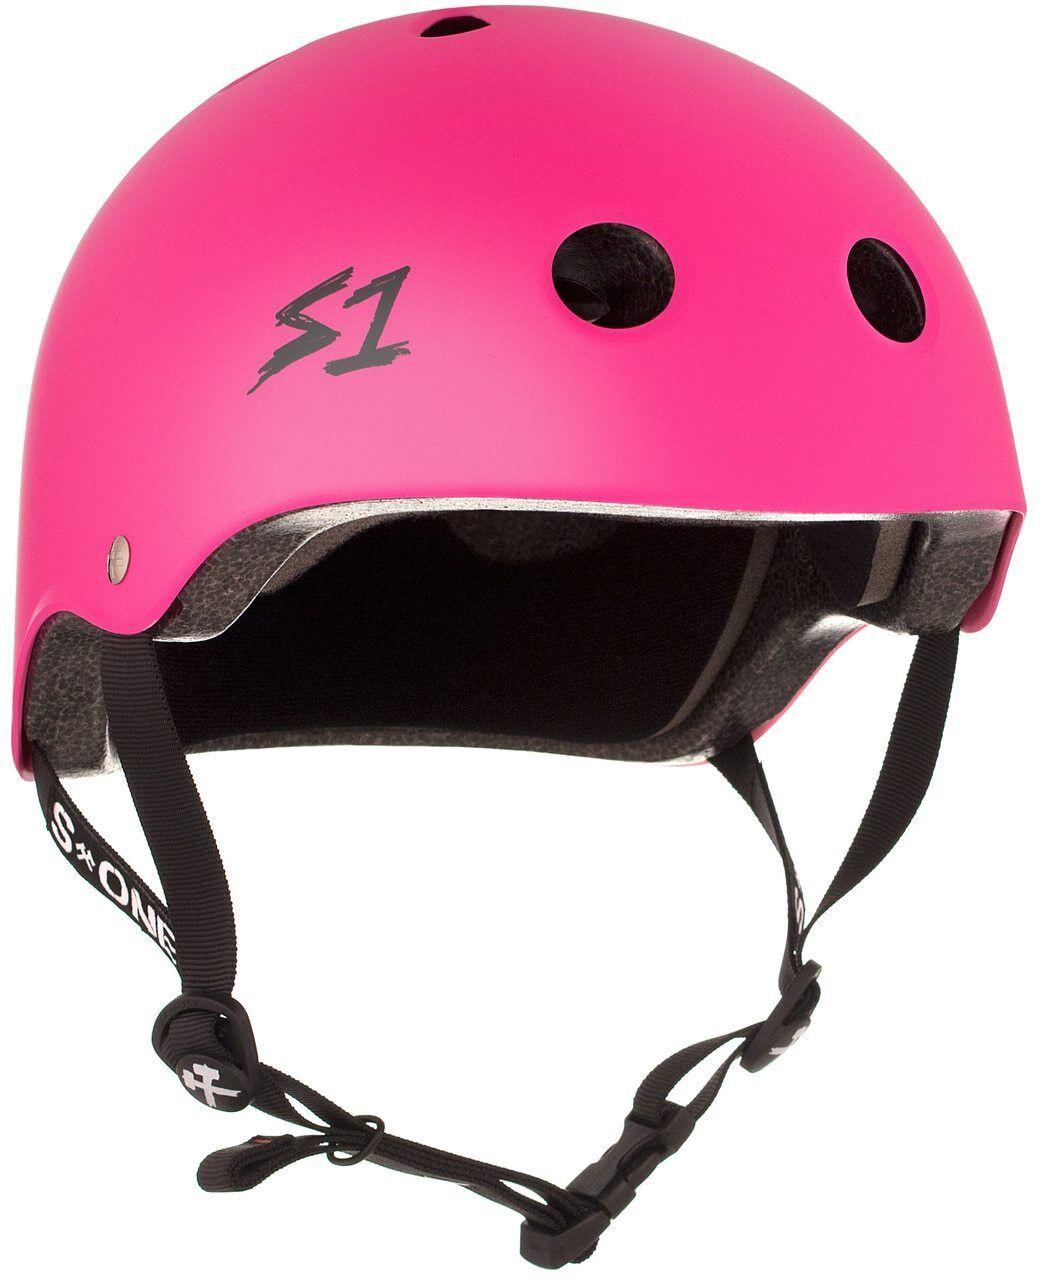 S1  Lifer Helmet - Hot Pink Matte  very popular